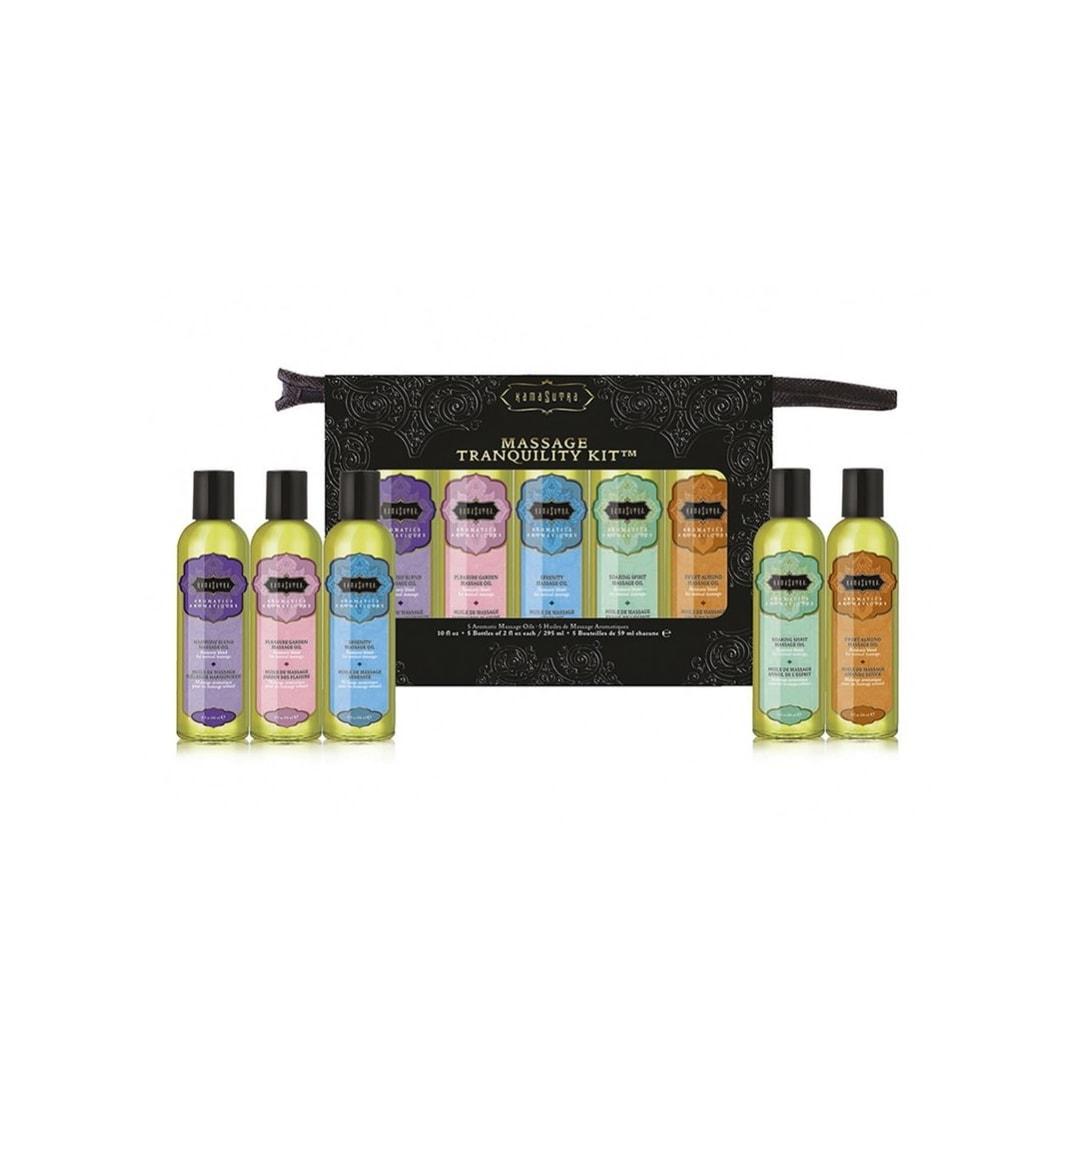 Massage Tranquility Kit - Sett med fem massasjeoljer - Kama Sutra